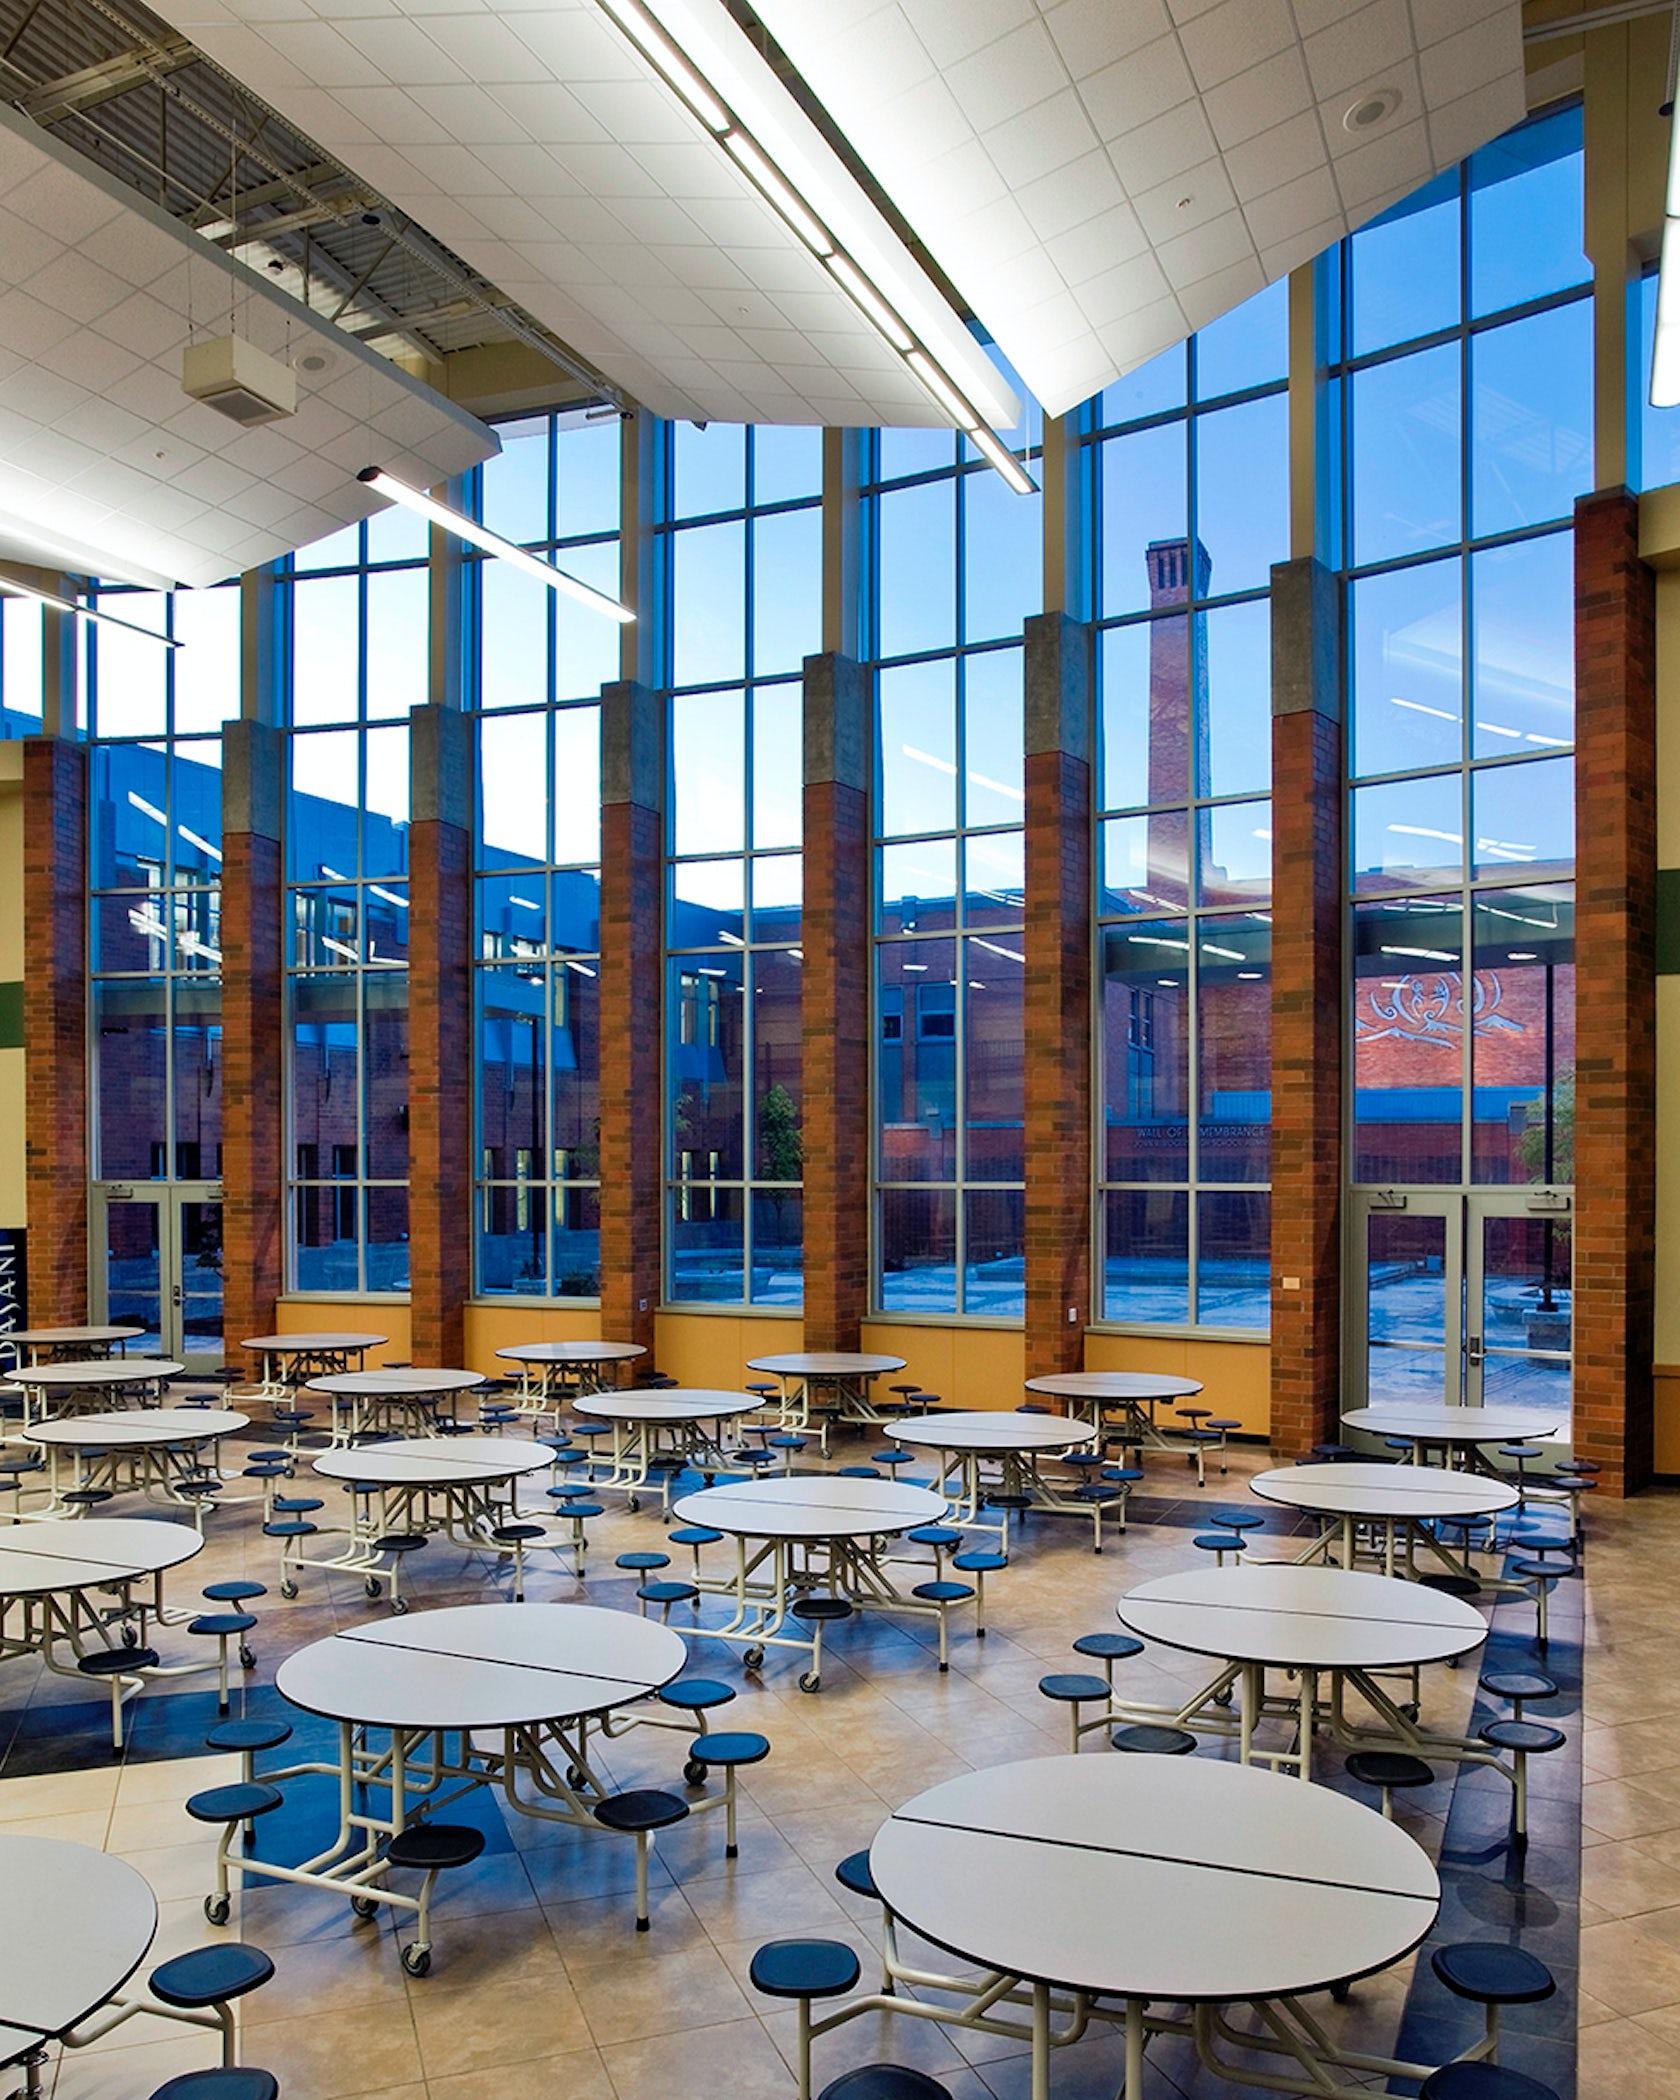 Stem School West Seattle: Rogers High School Renovation & Addition